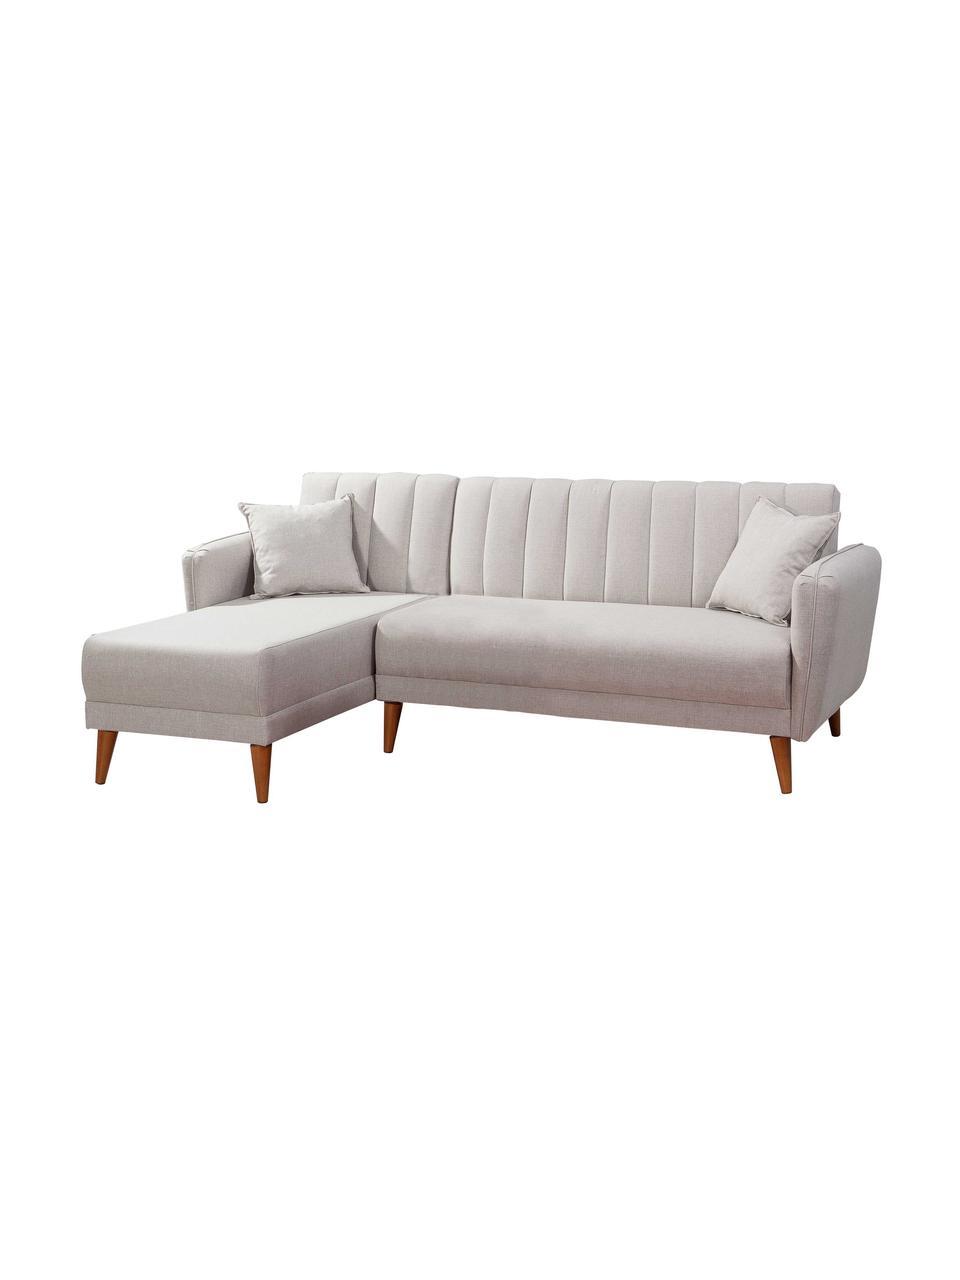 Leinen-Ecksofa Aqua (3-Sitzer) mit Schlaffunktion, Bezug: Leinen, Gestell: Hornbaumholz, Metall, Füße: Holz, Beige, B 225 x T 145 cm